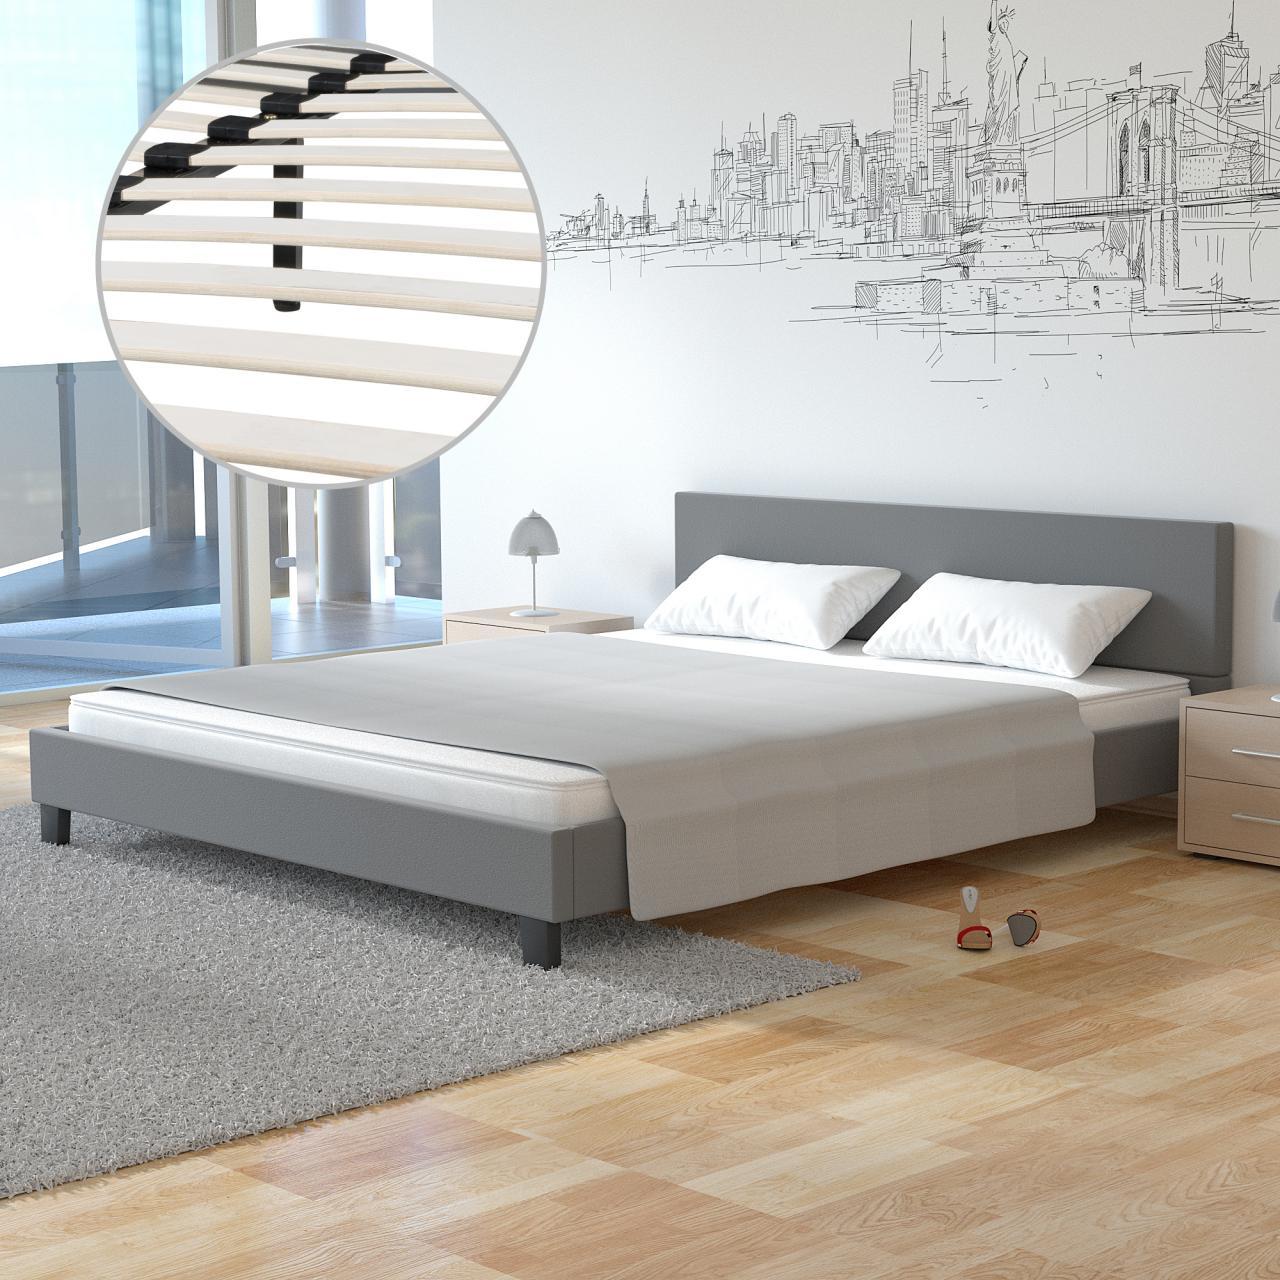 polsterbett doppelbett bettgestell bettrahmen. Black Bedroom Furniture Sets. Home Design Ideas